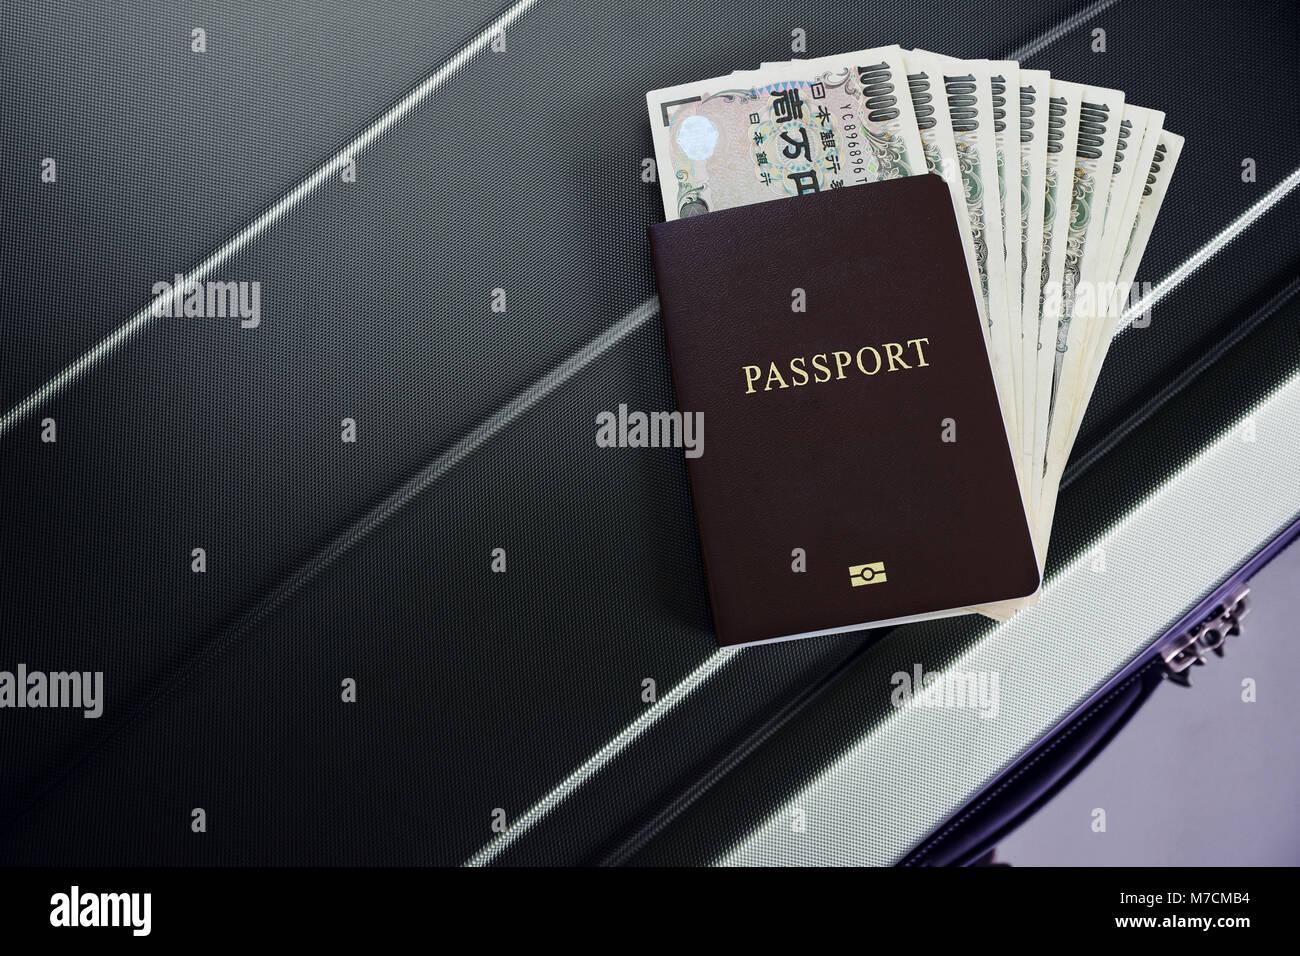 Passport money luggage stock photos passport money for Spa uniform suppliers cape town